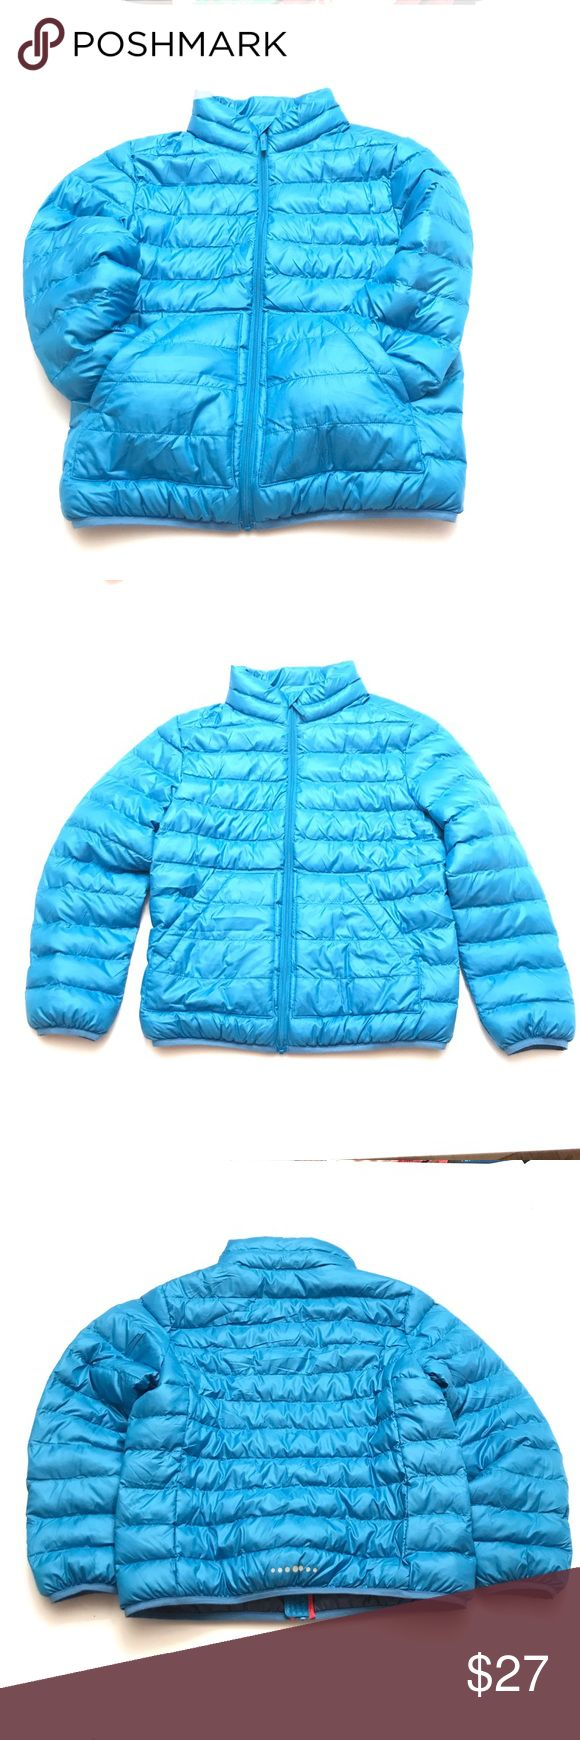 Uniqlo Blue Puffer jacket Blue puffer jacket, Puffer